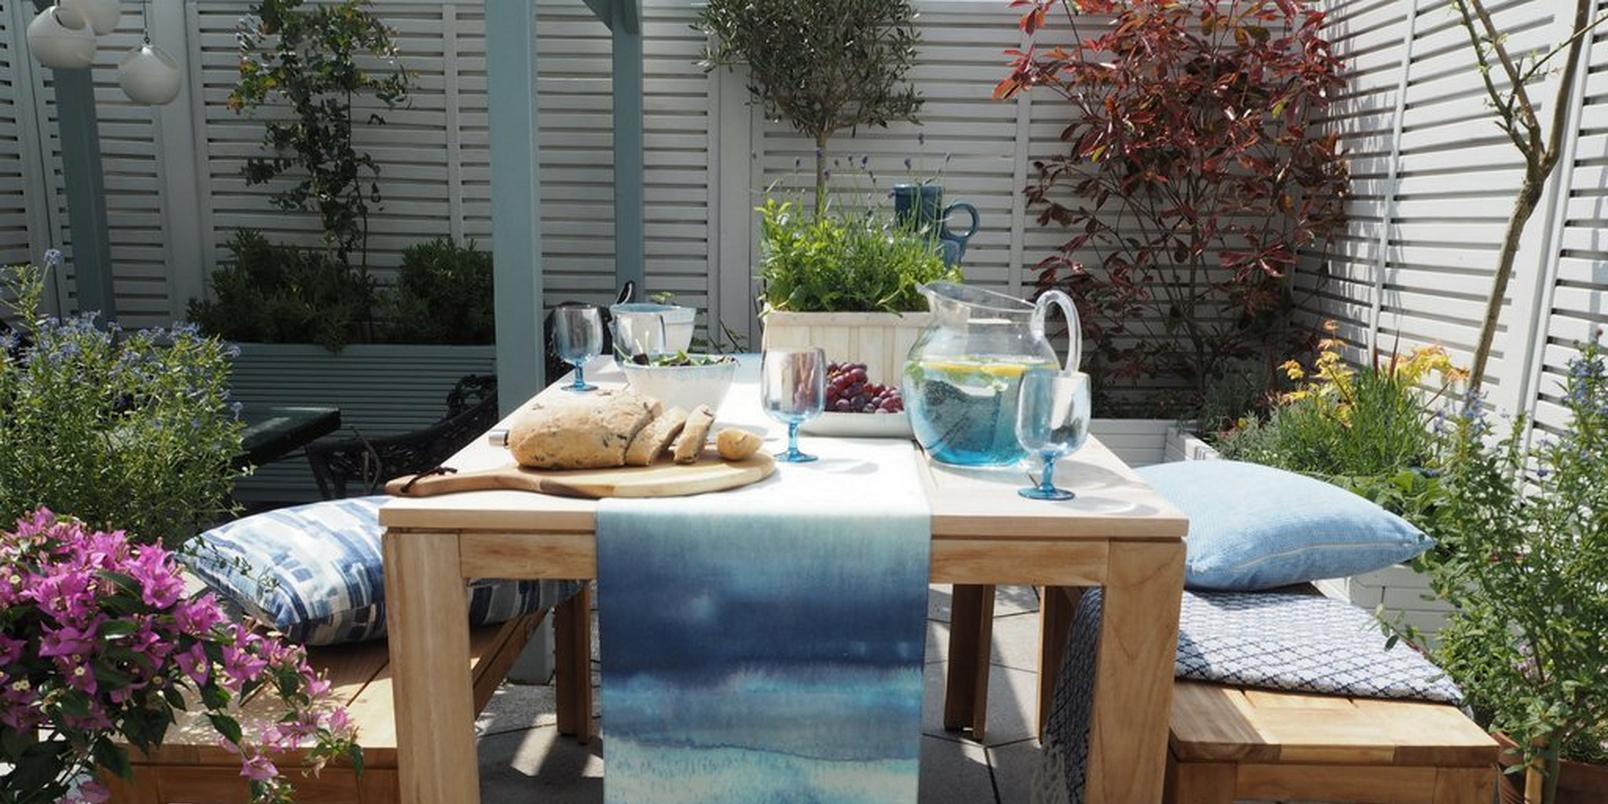 garden_party-decoration_ideas4